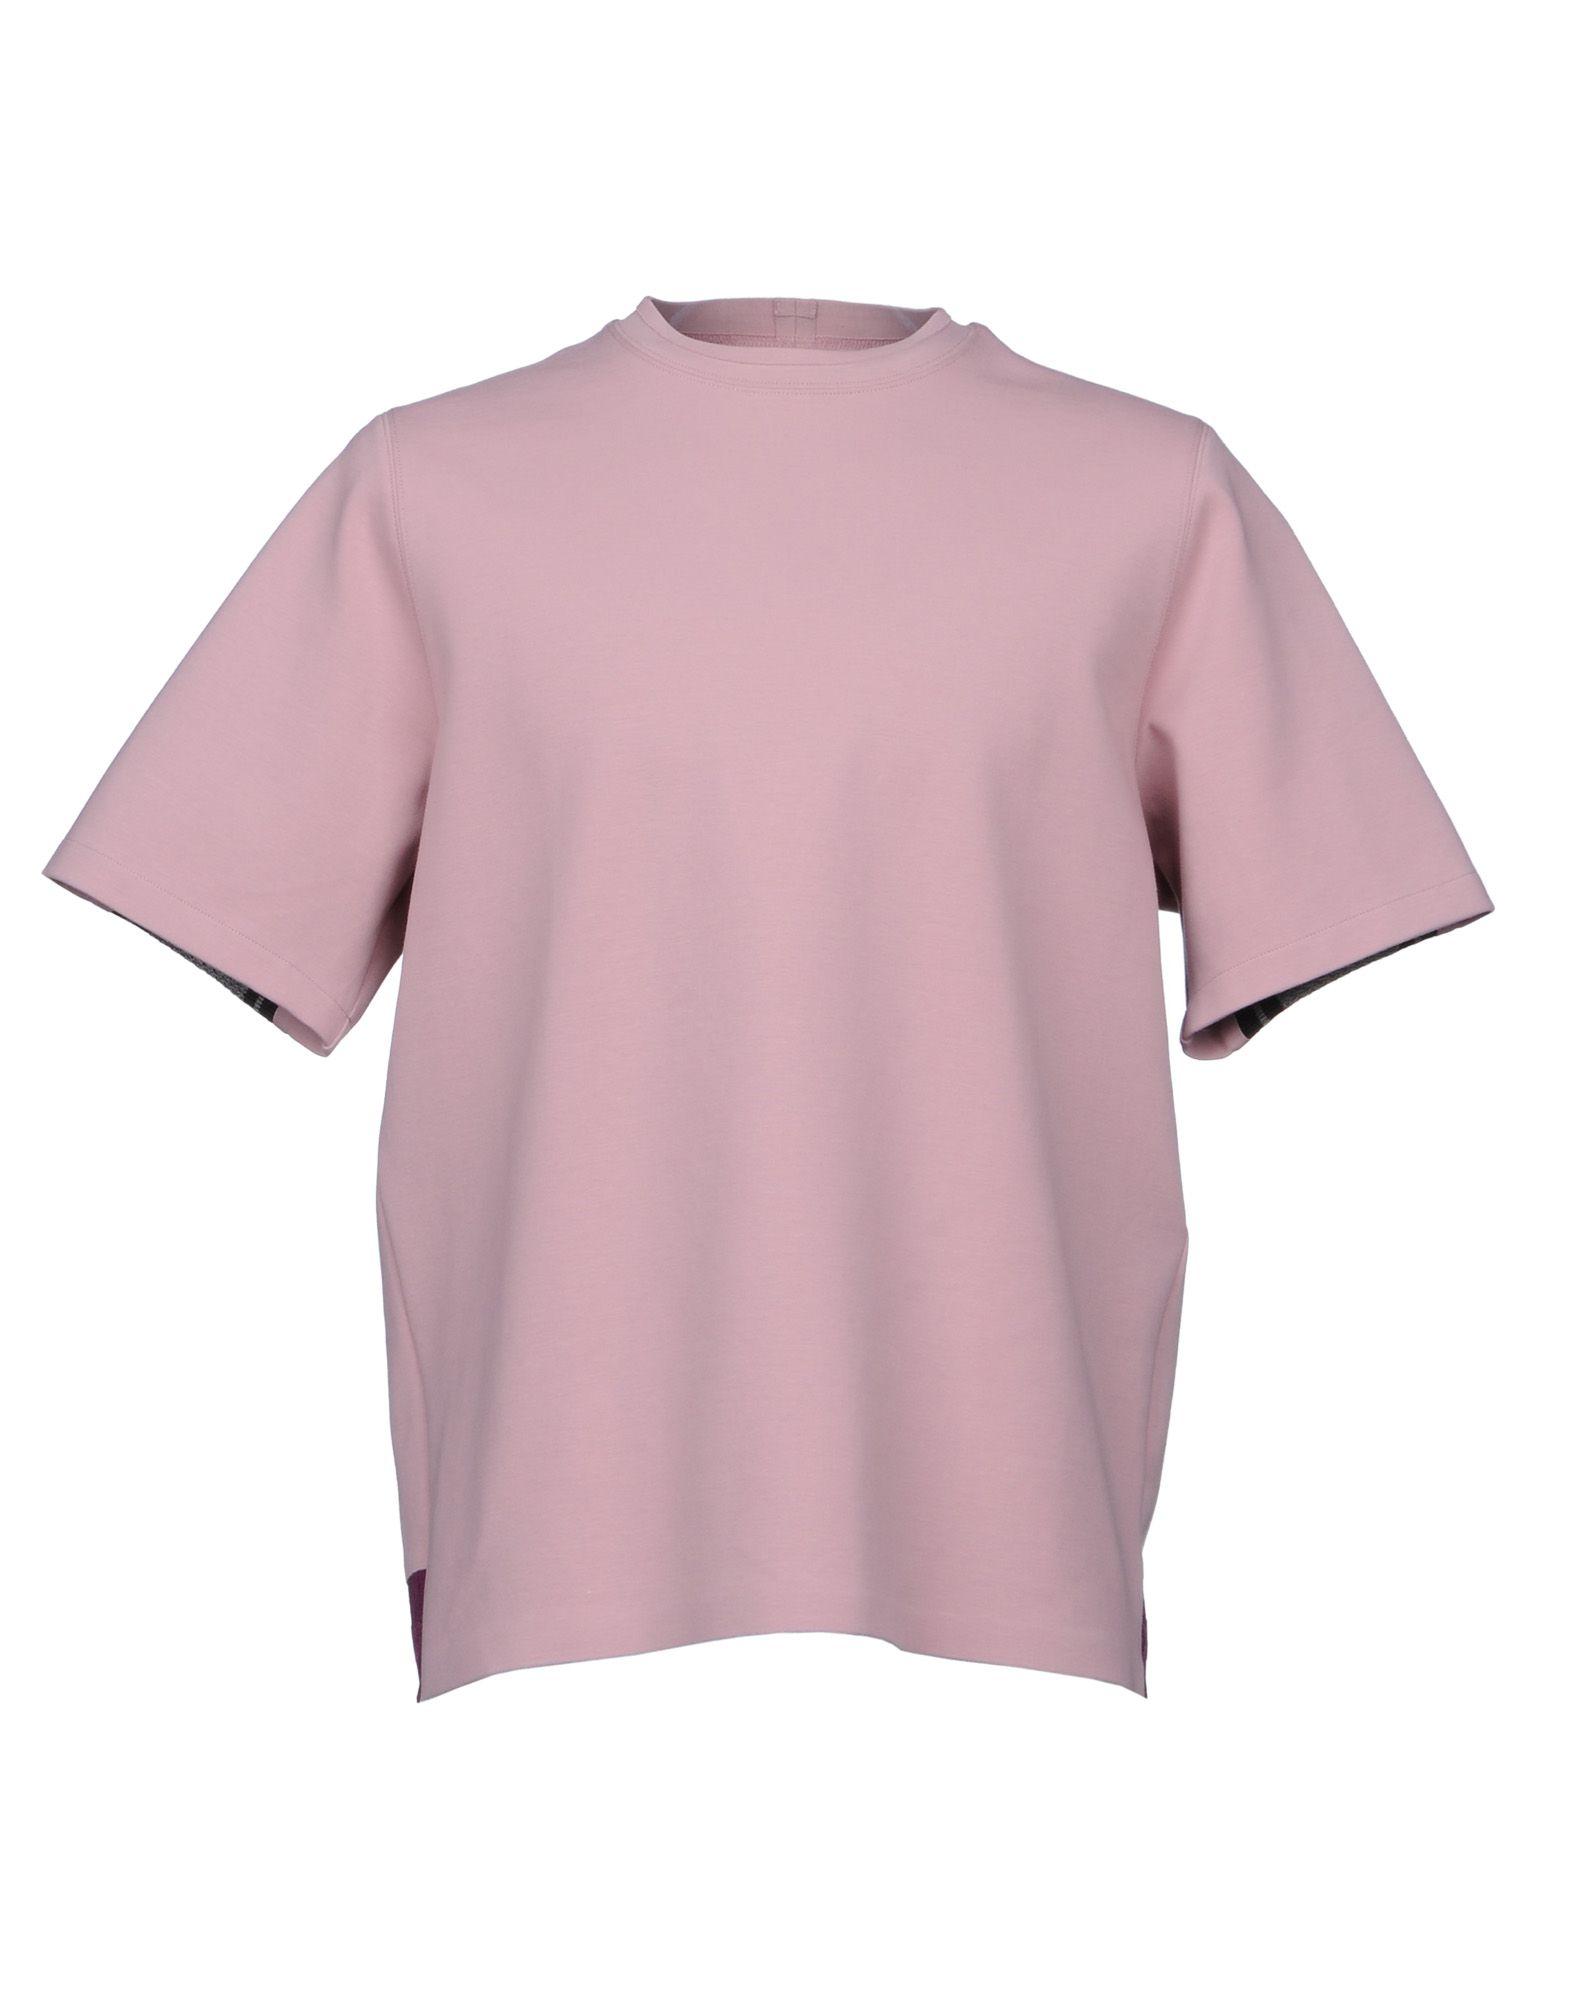 OAMC Herren T-shirts Farbe Hellrosa Größe 3